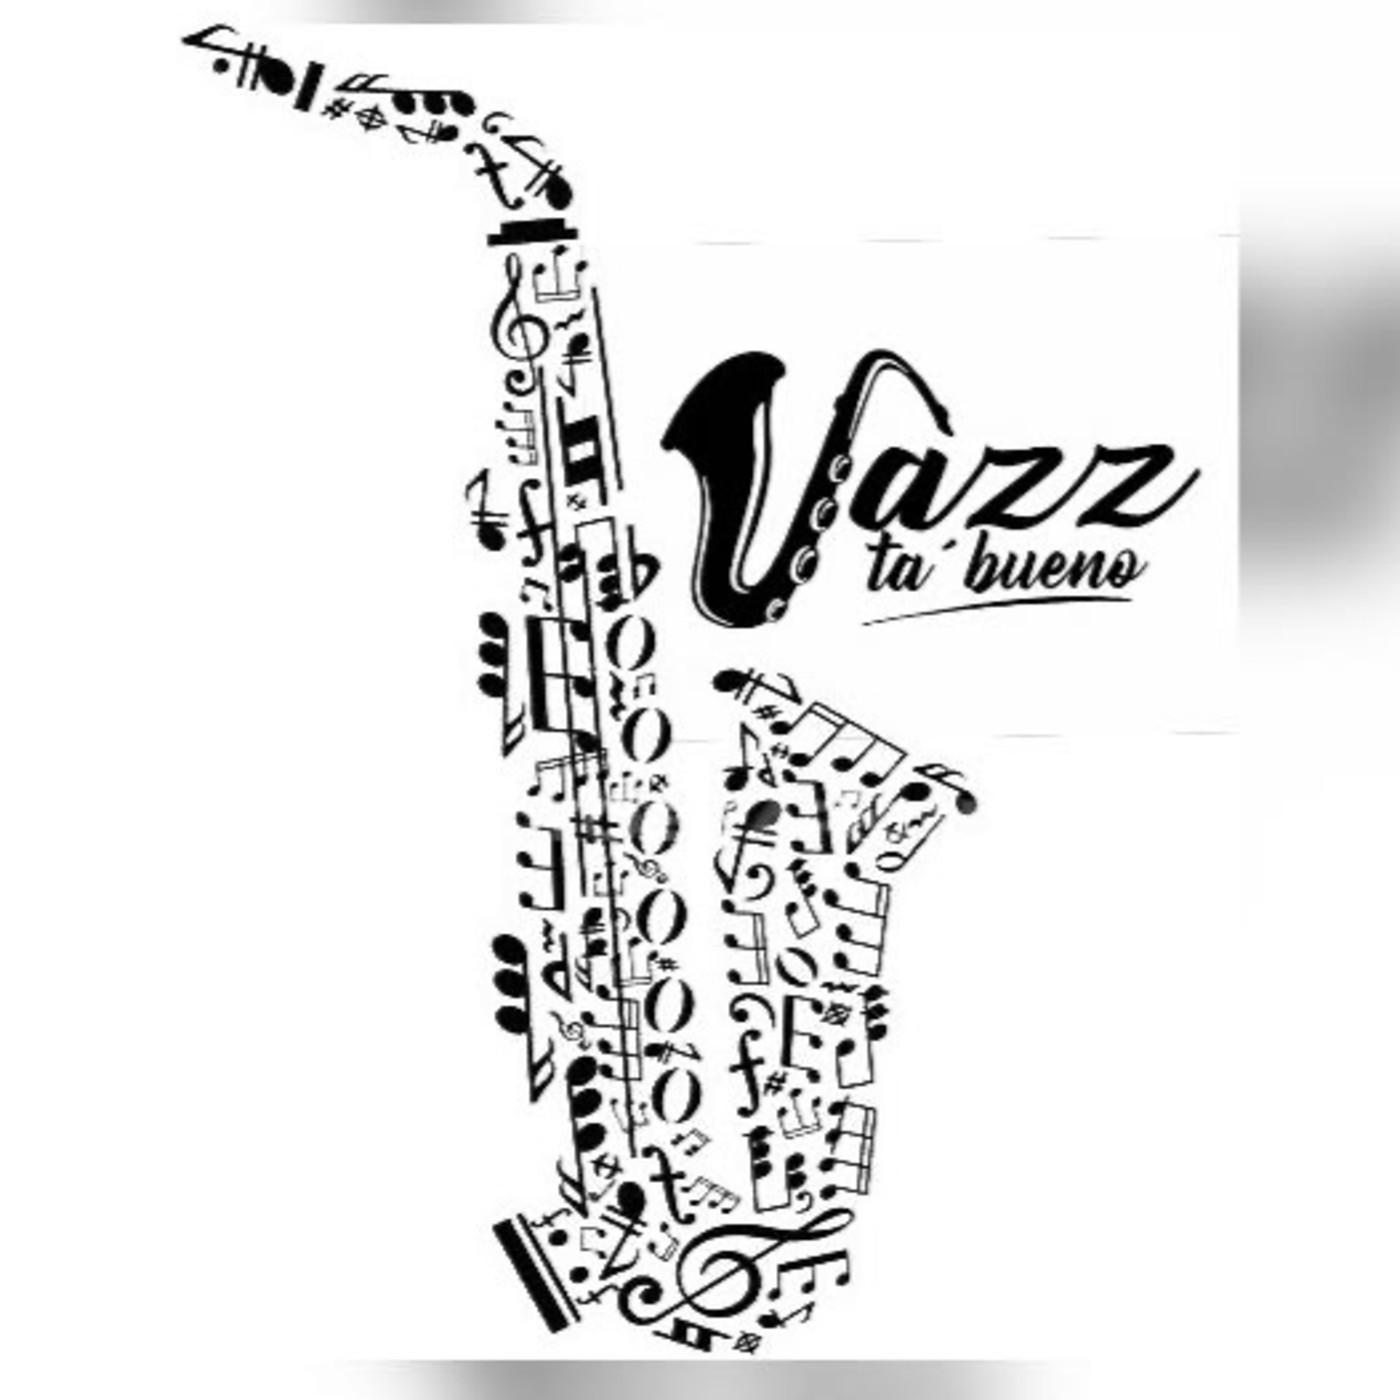 JazzTaBueno 17/2020 *This is*